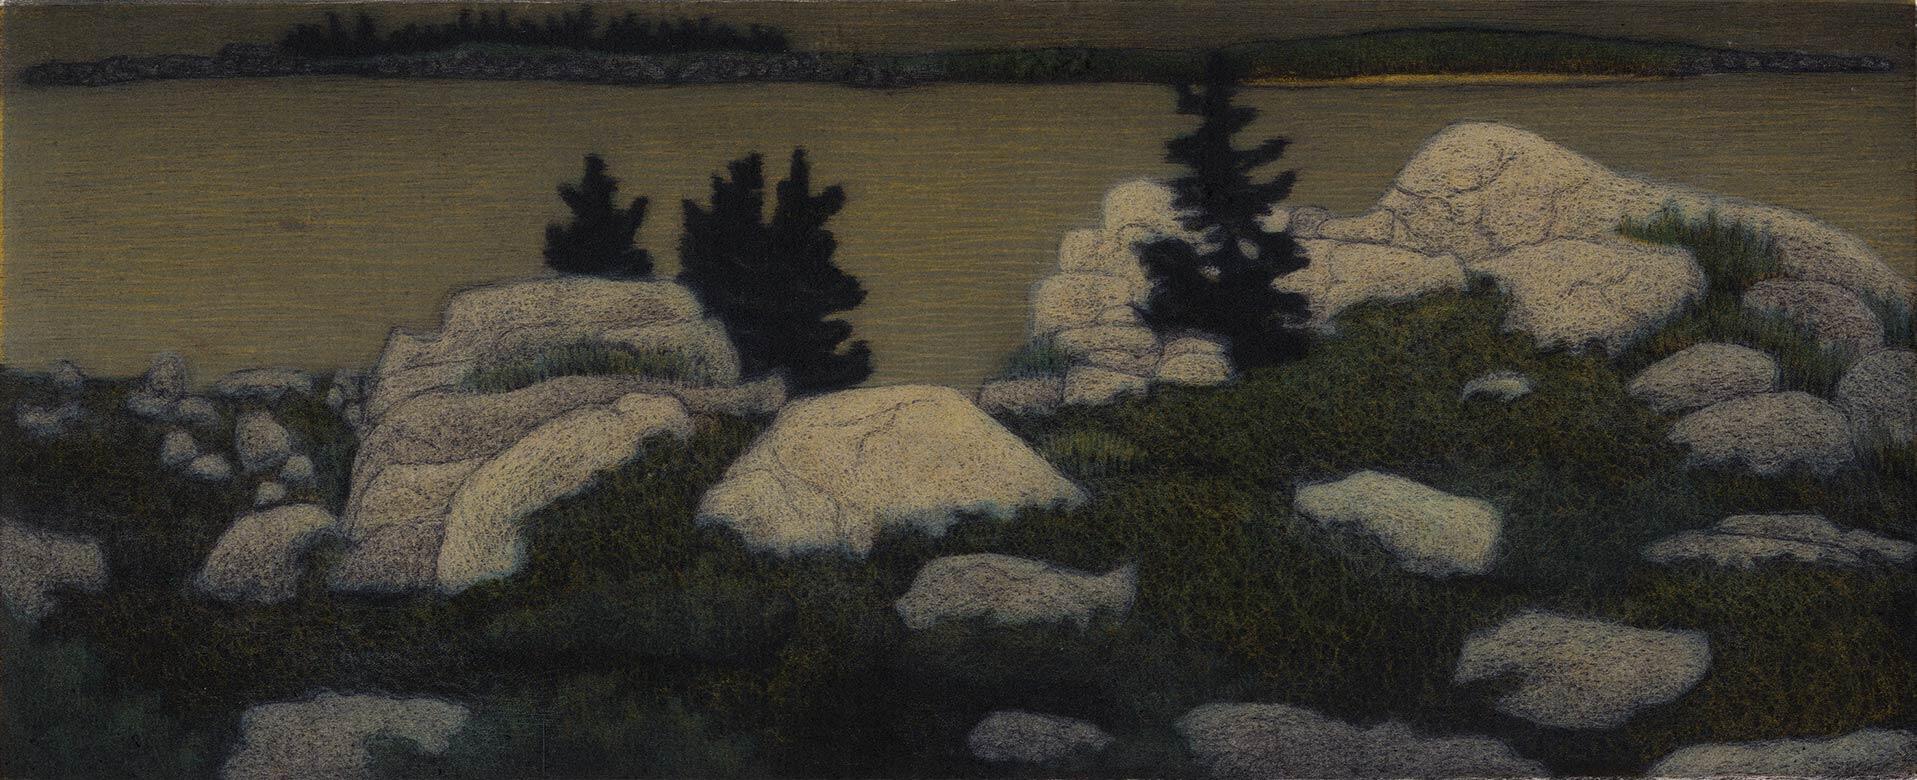 Night at Granite Bluff